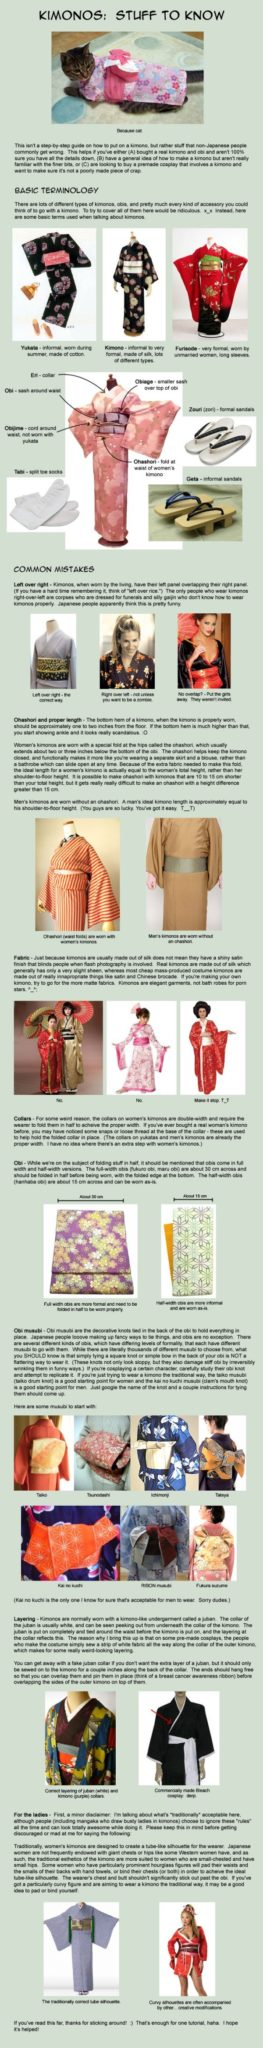 A collector of kimono gives a crash course on identifying, wearing kimono, yukata, furisode, obi, tabi, geta, zouri, obiage, obijime, eri, ohashori, juban.